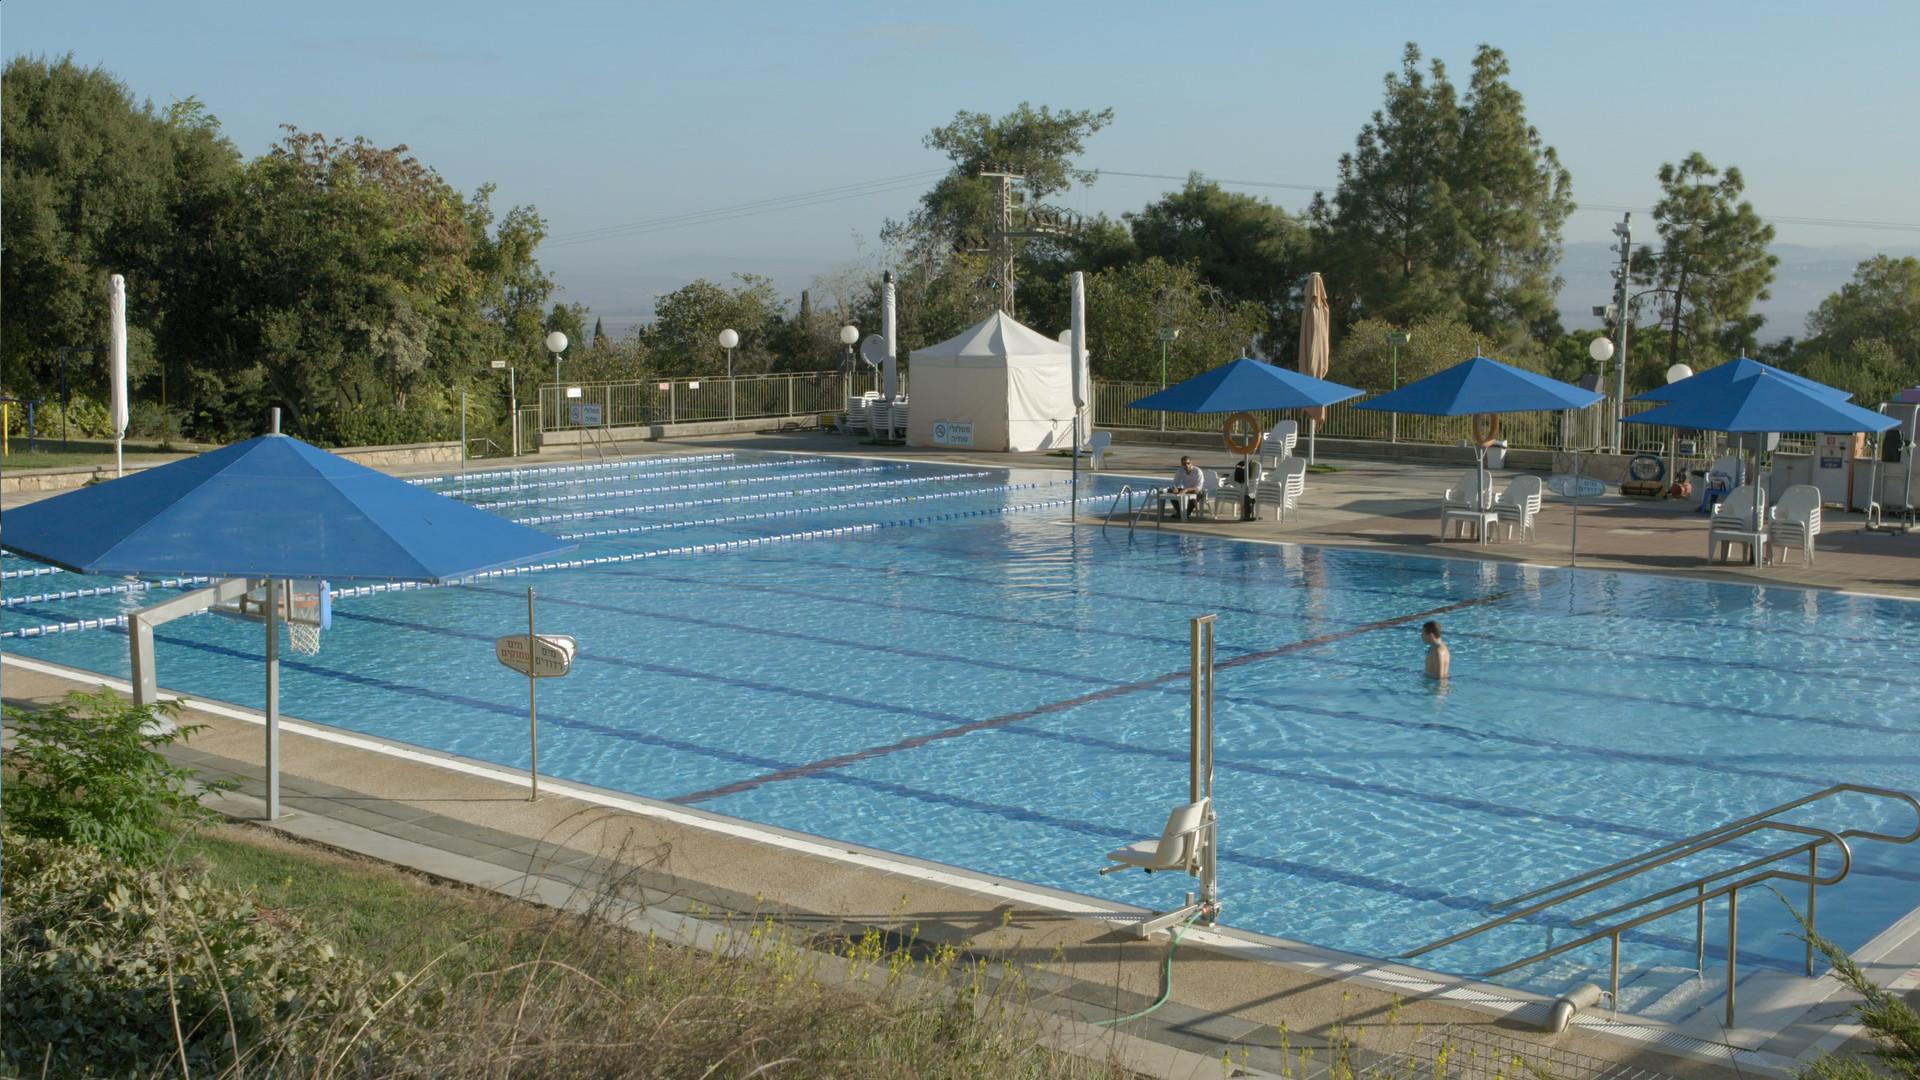 Pool - Frame 3.jpg